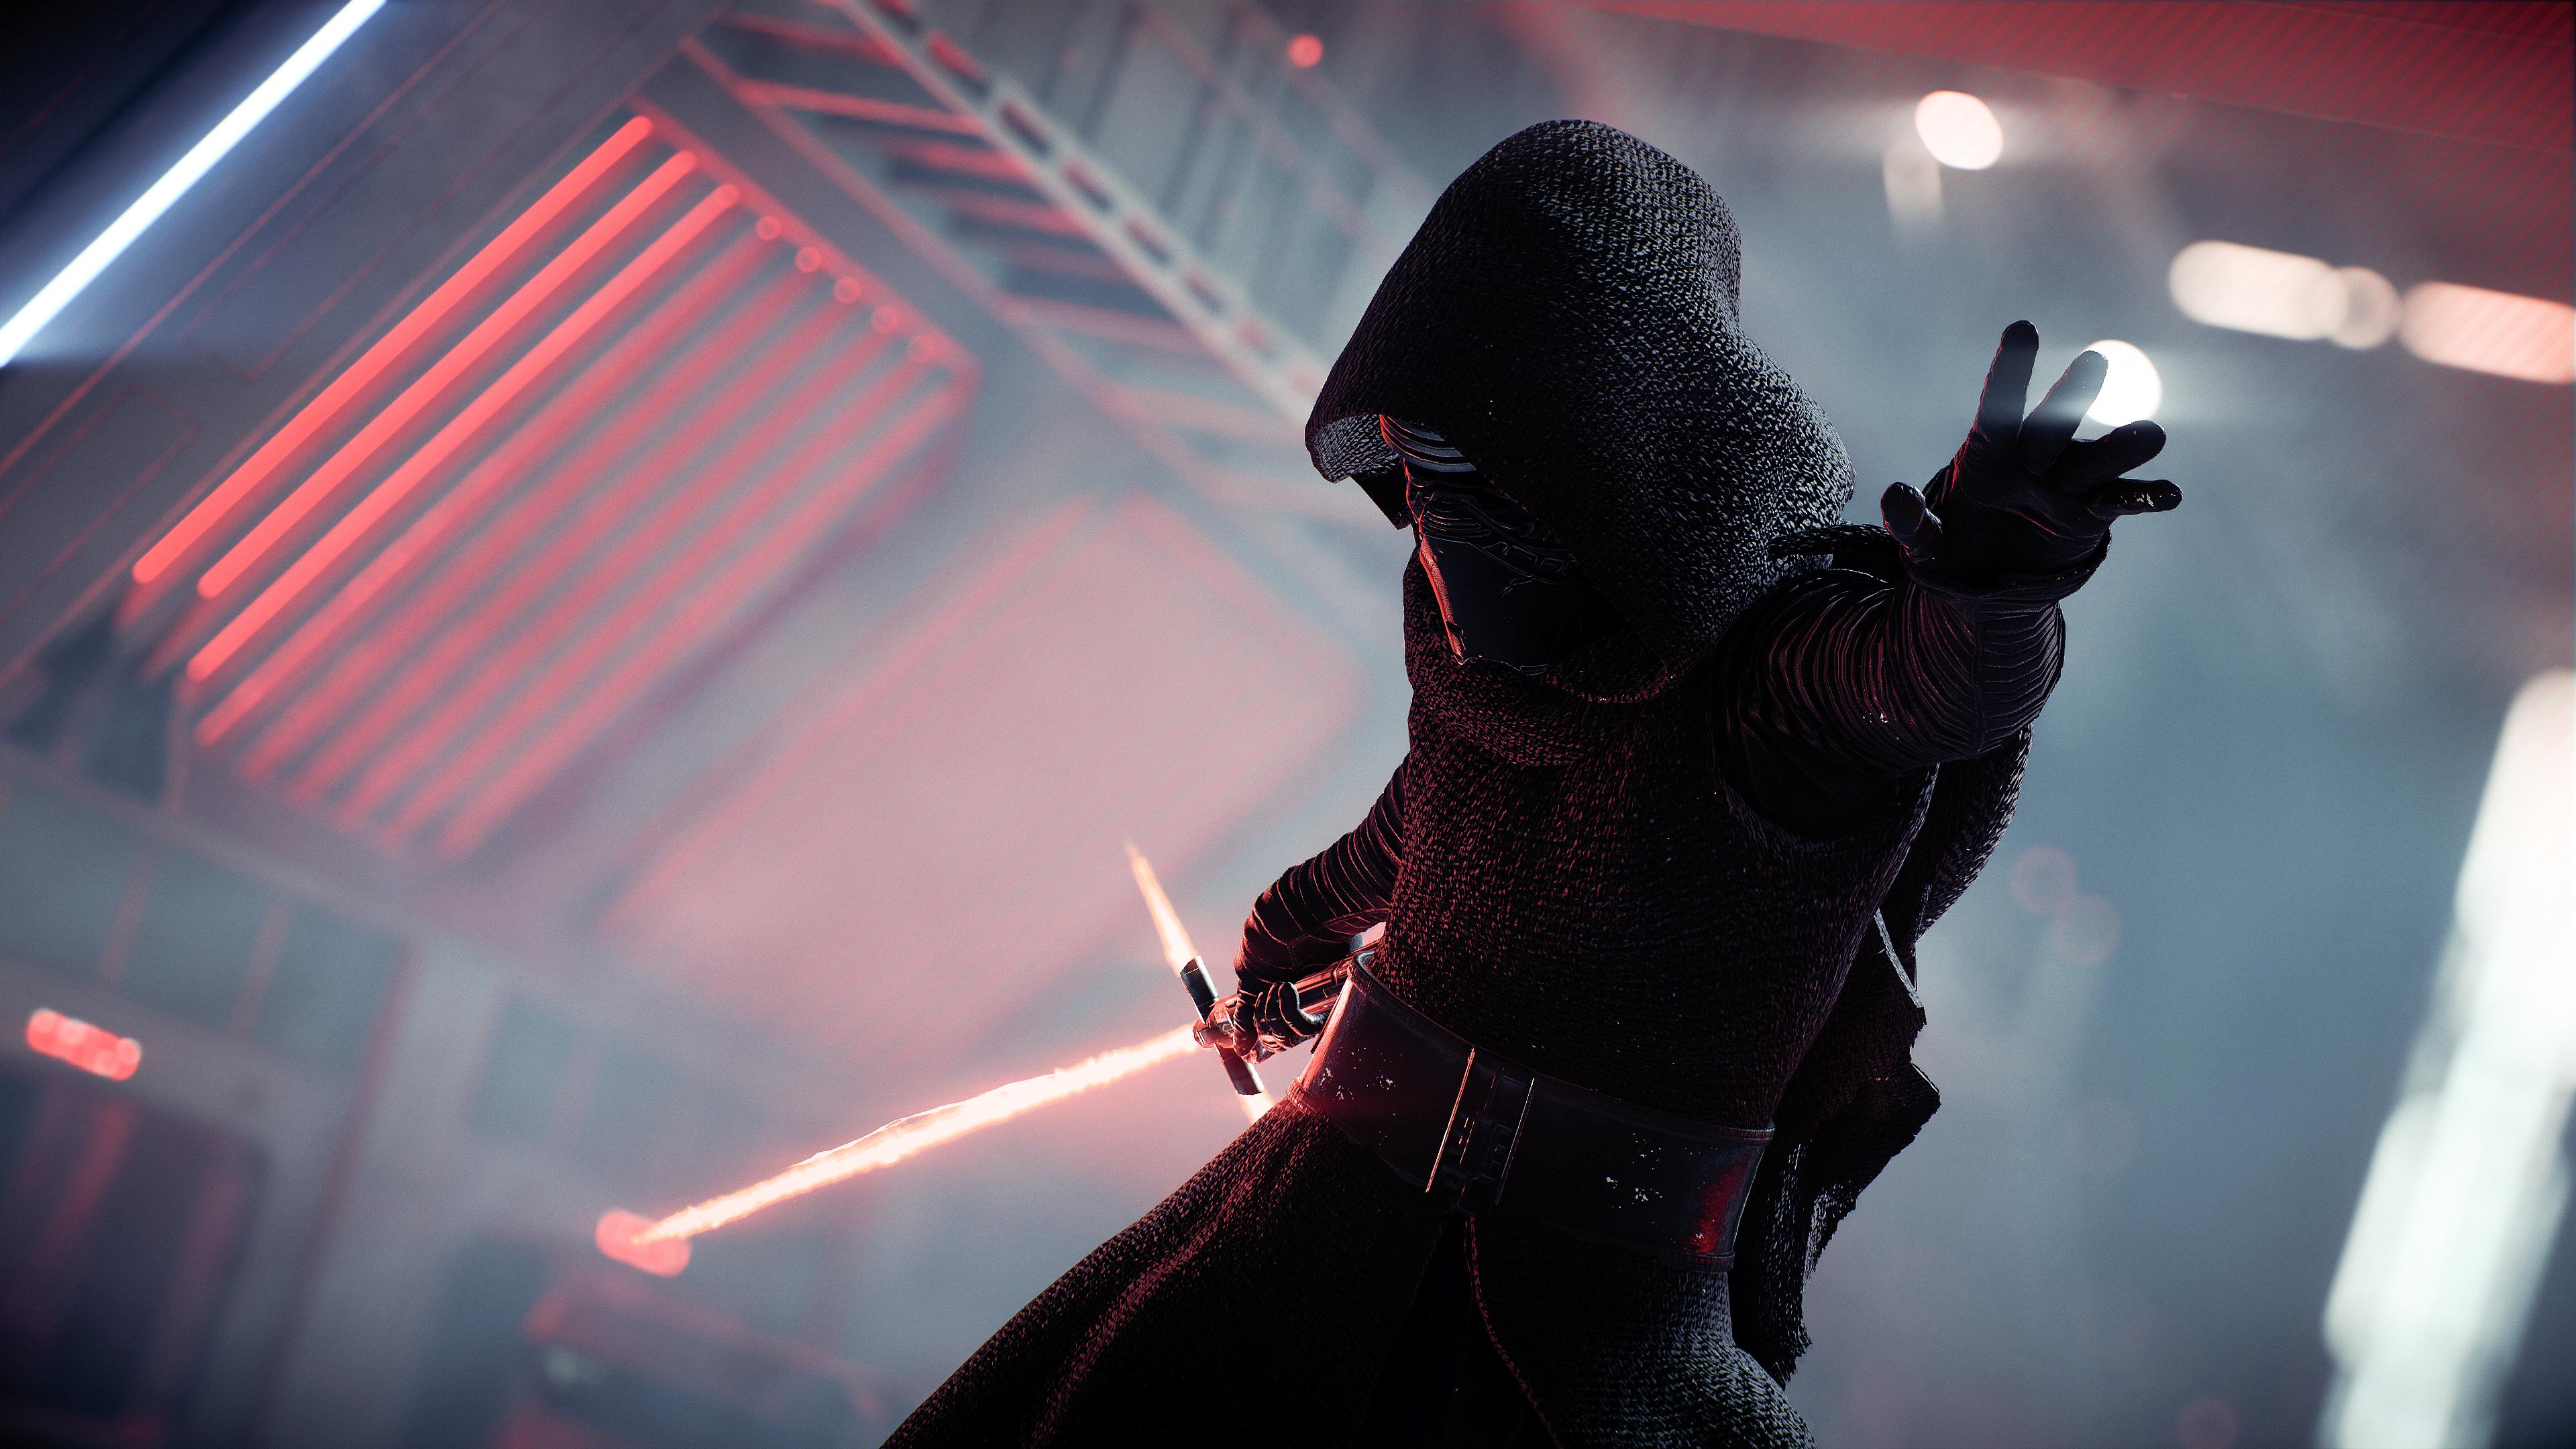 3840x2160 Darth Vader Star Wars Battlefront 4k 4k Hd 4k